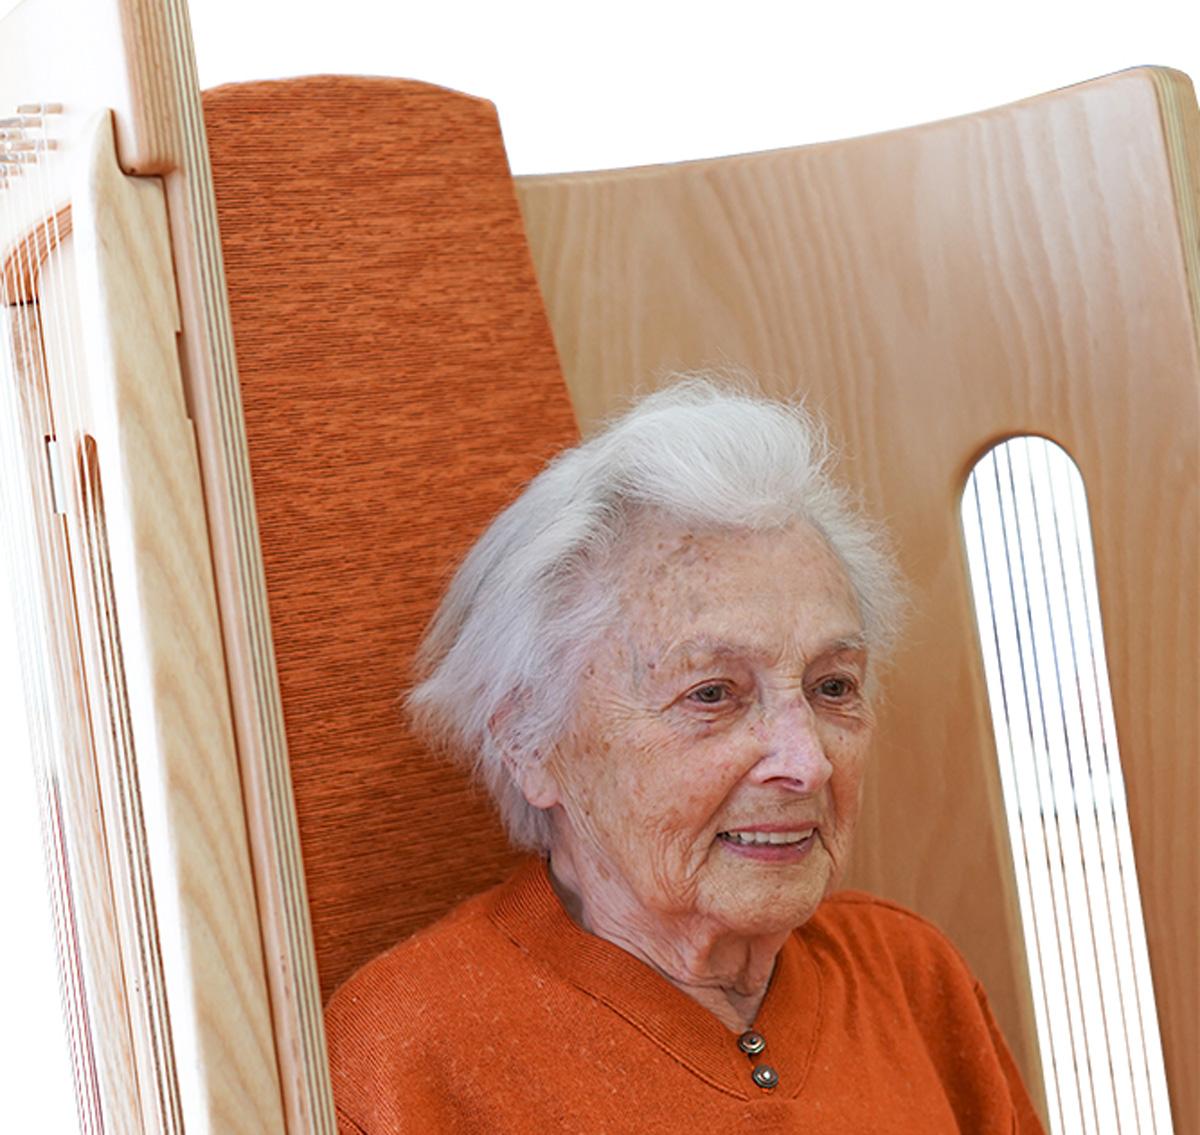 Allton-Klangstuhl Wir sind Altenpflege